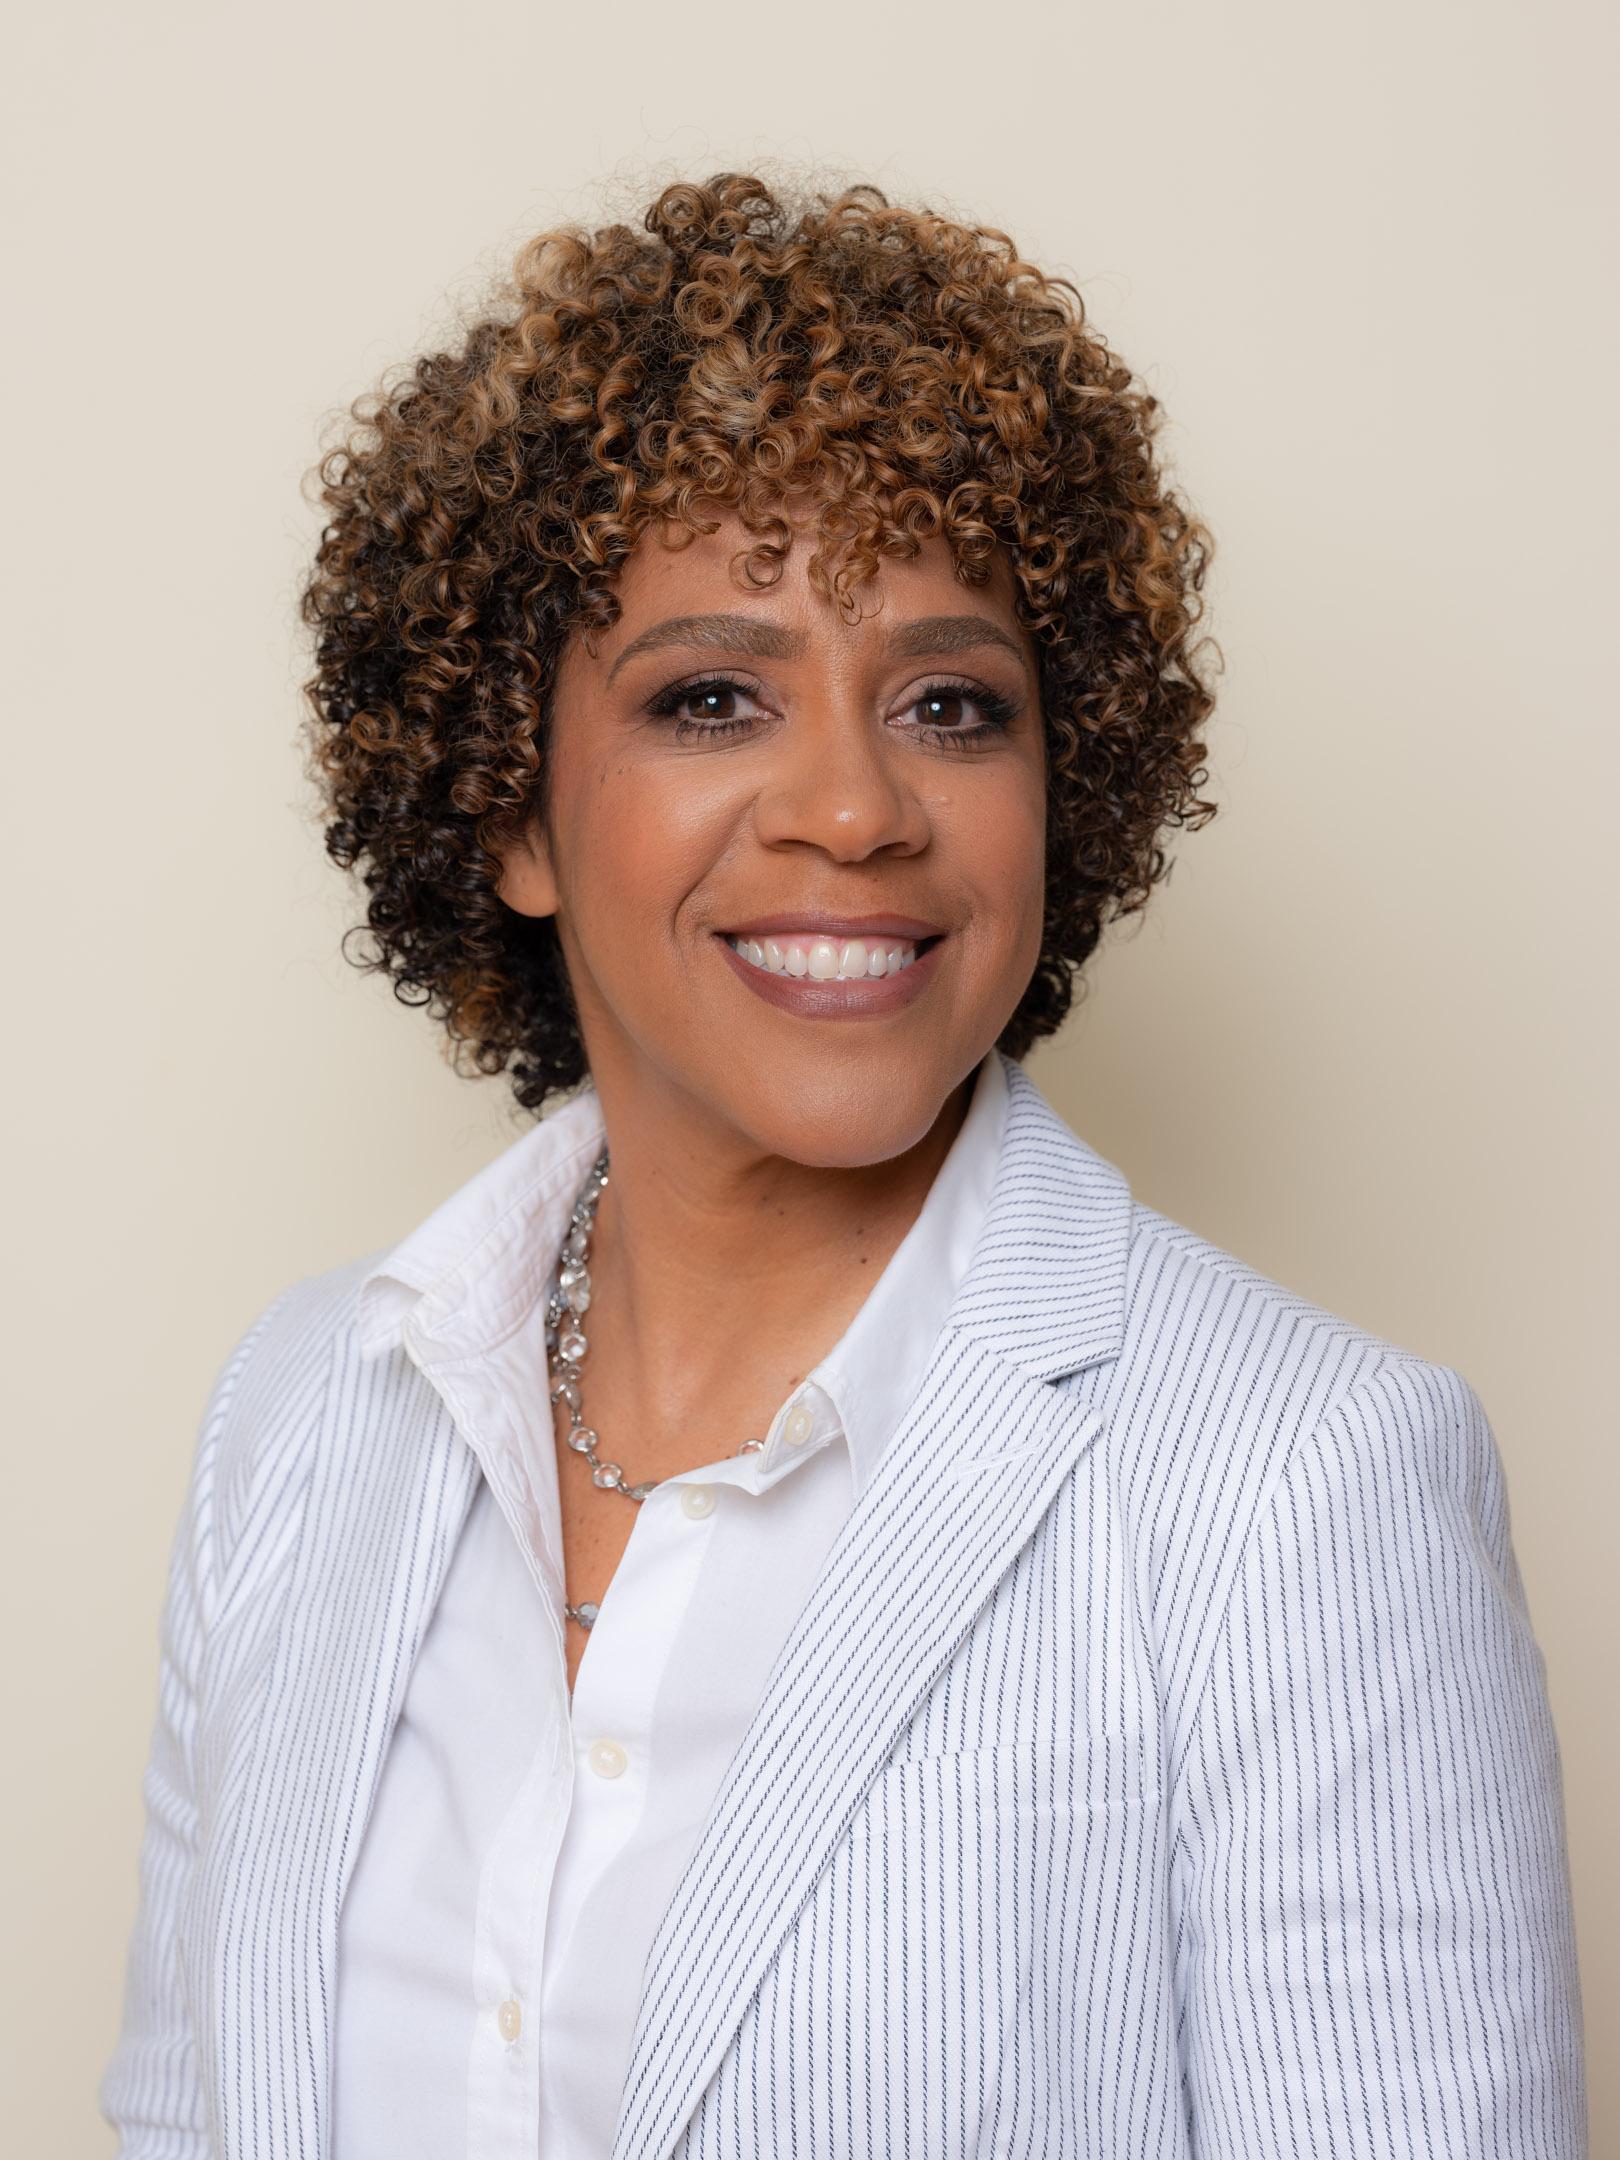 Former nonprofit executive Dianne Morales.